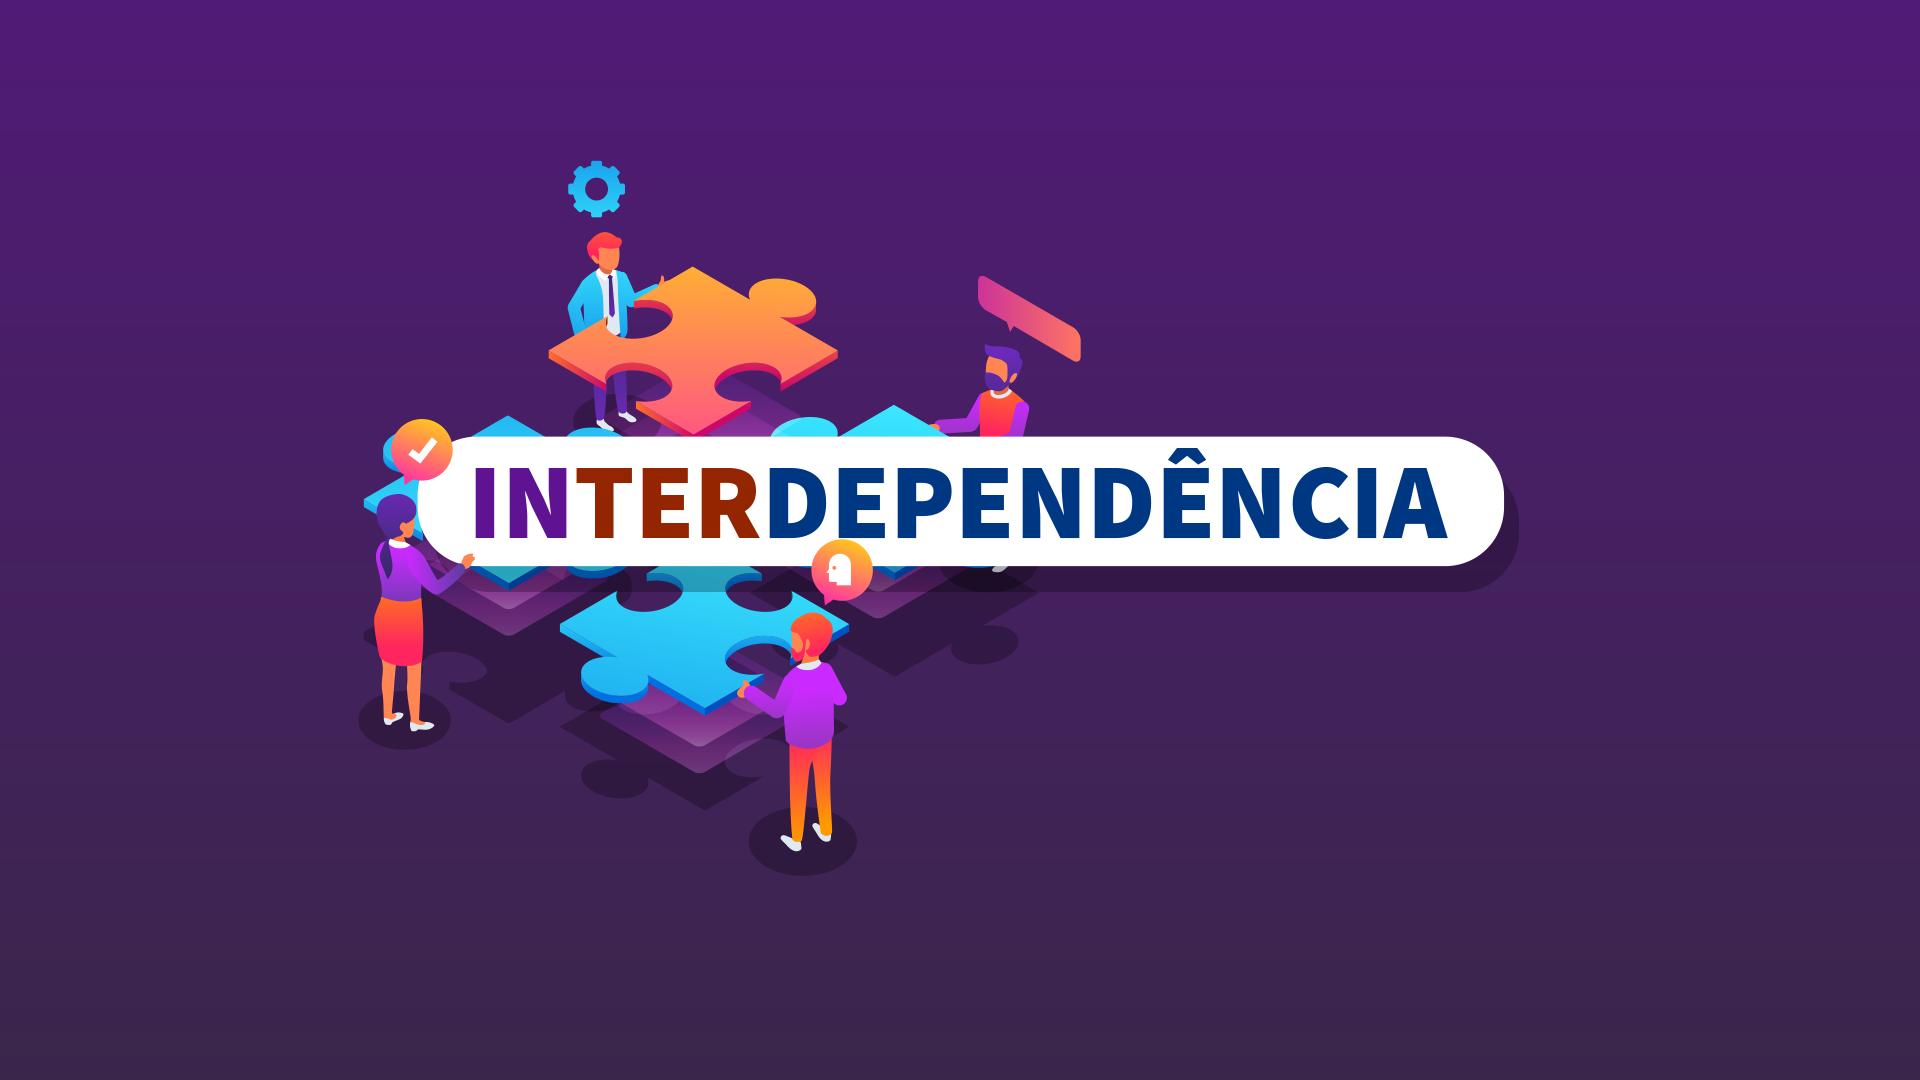 Dependência, independência e interdependência